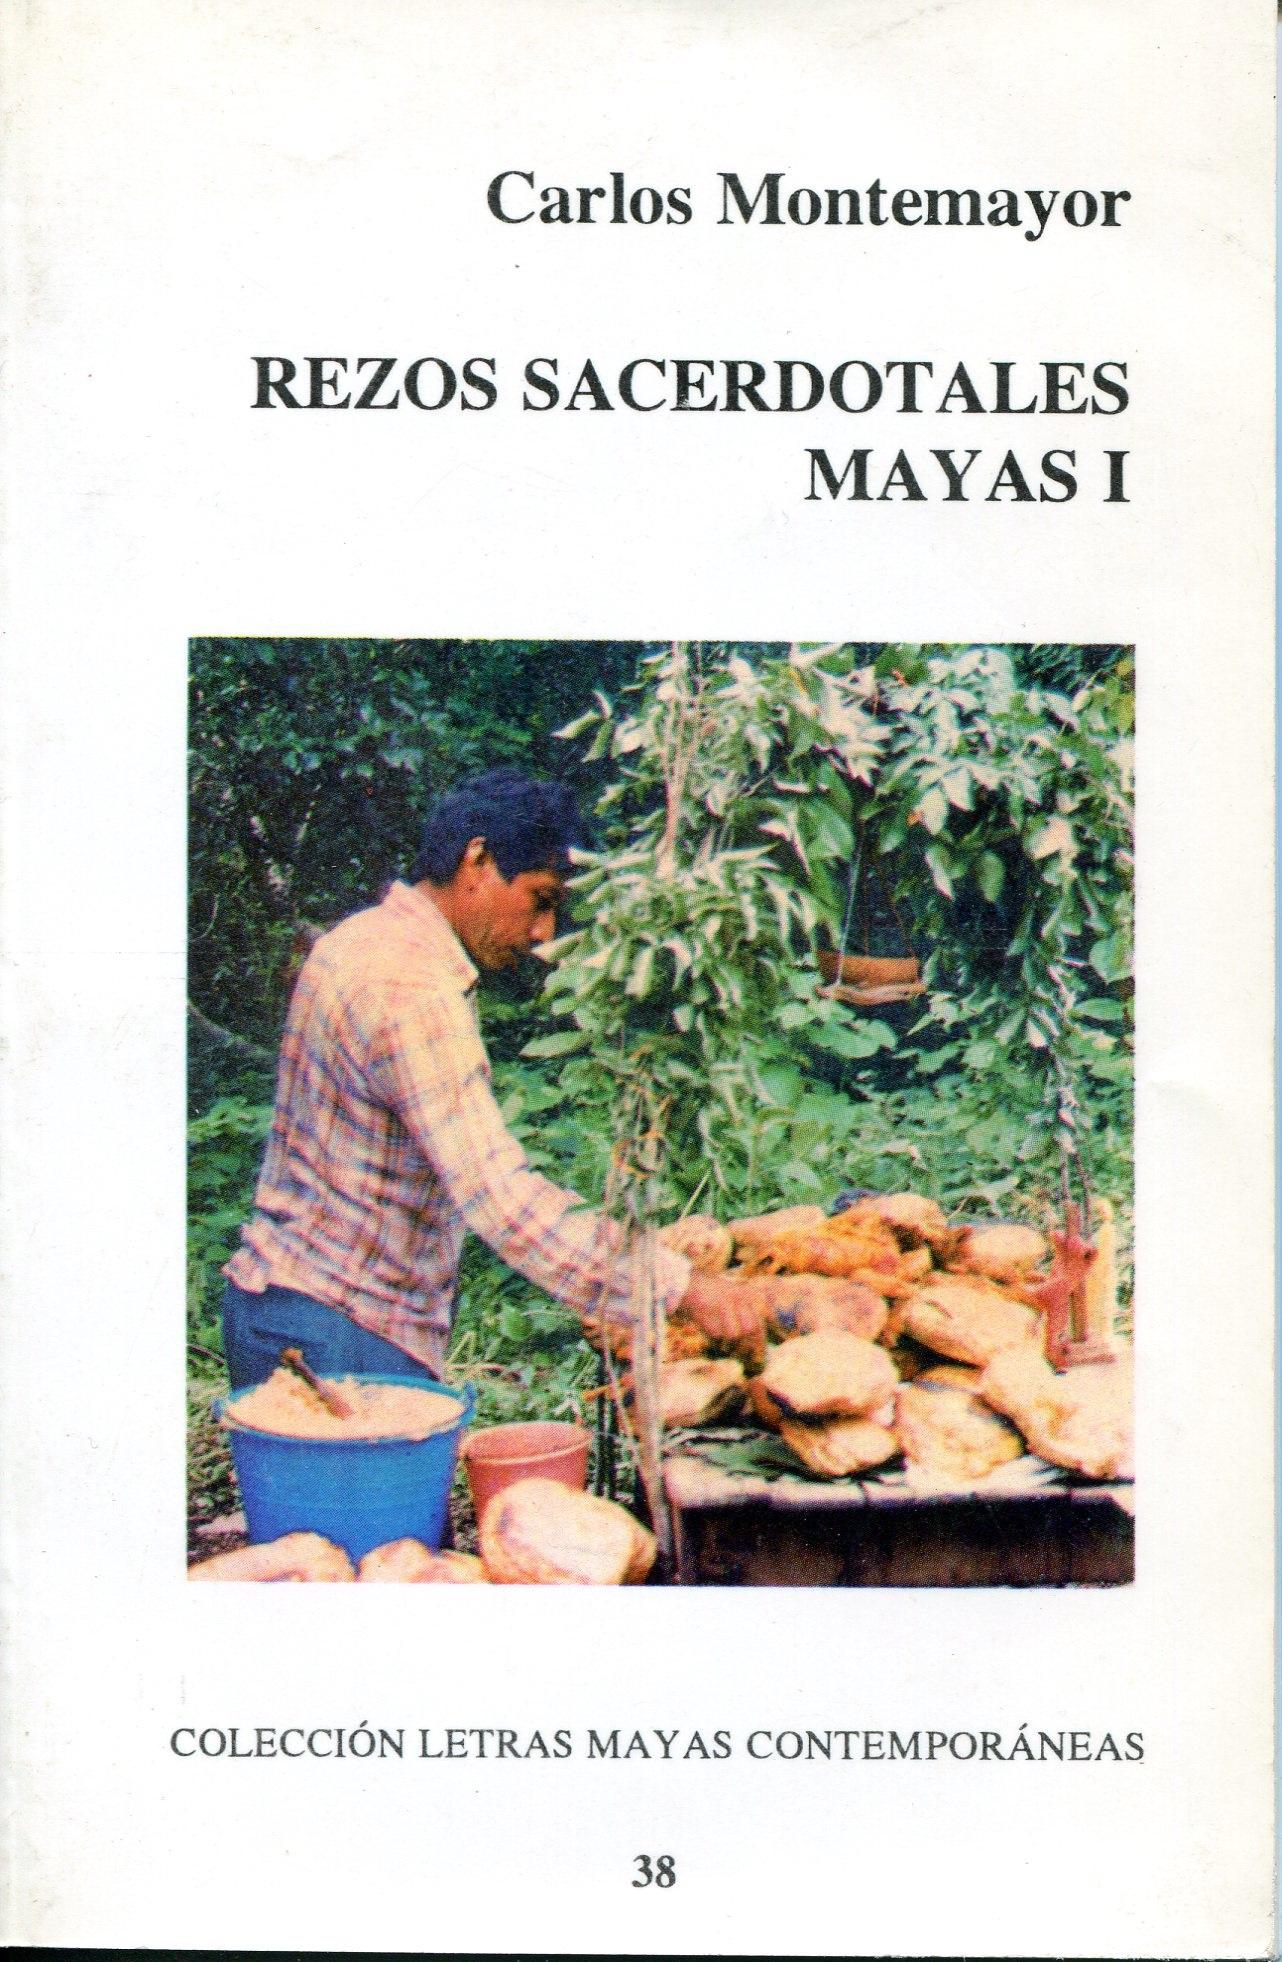 Rezos Sacerdotales Mayas I